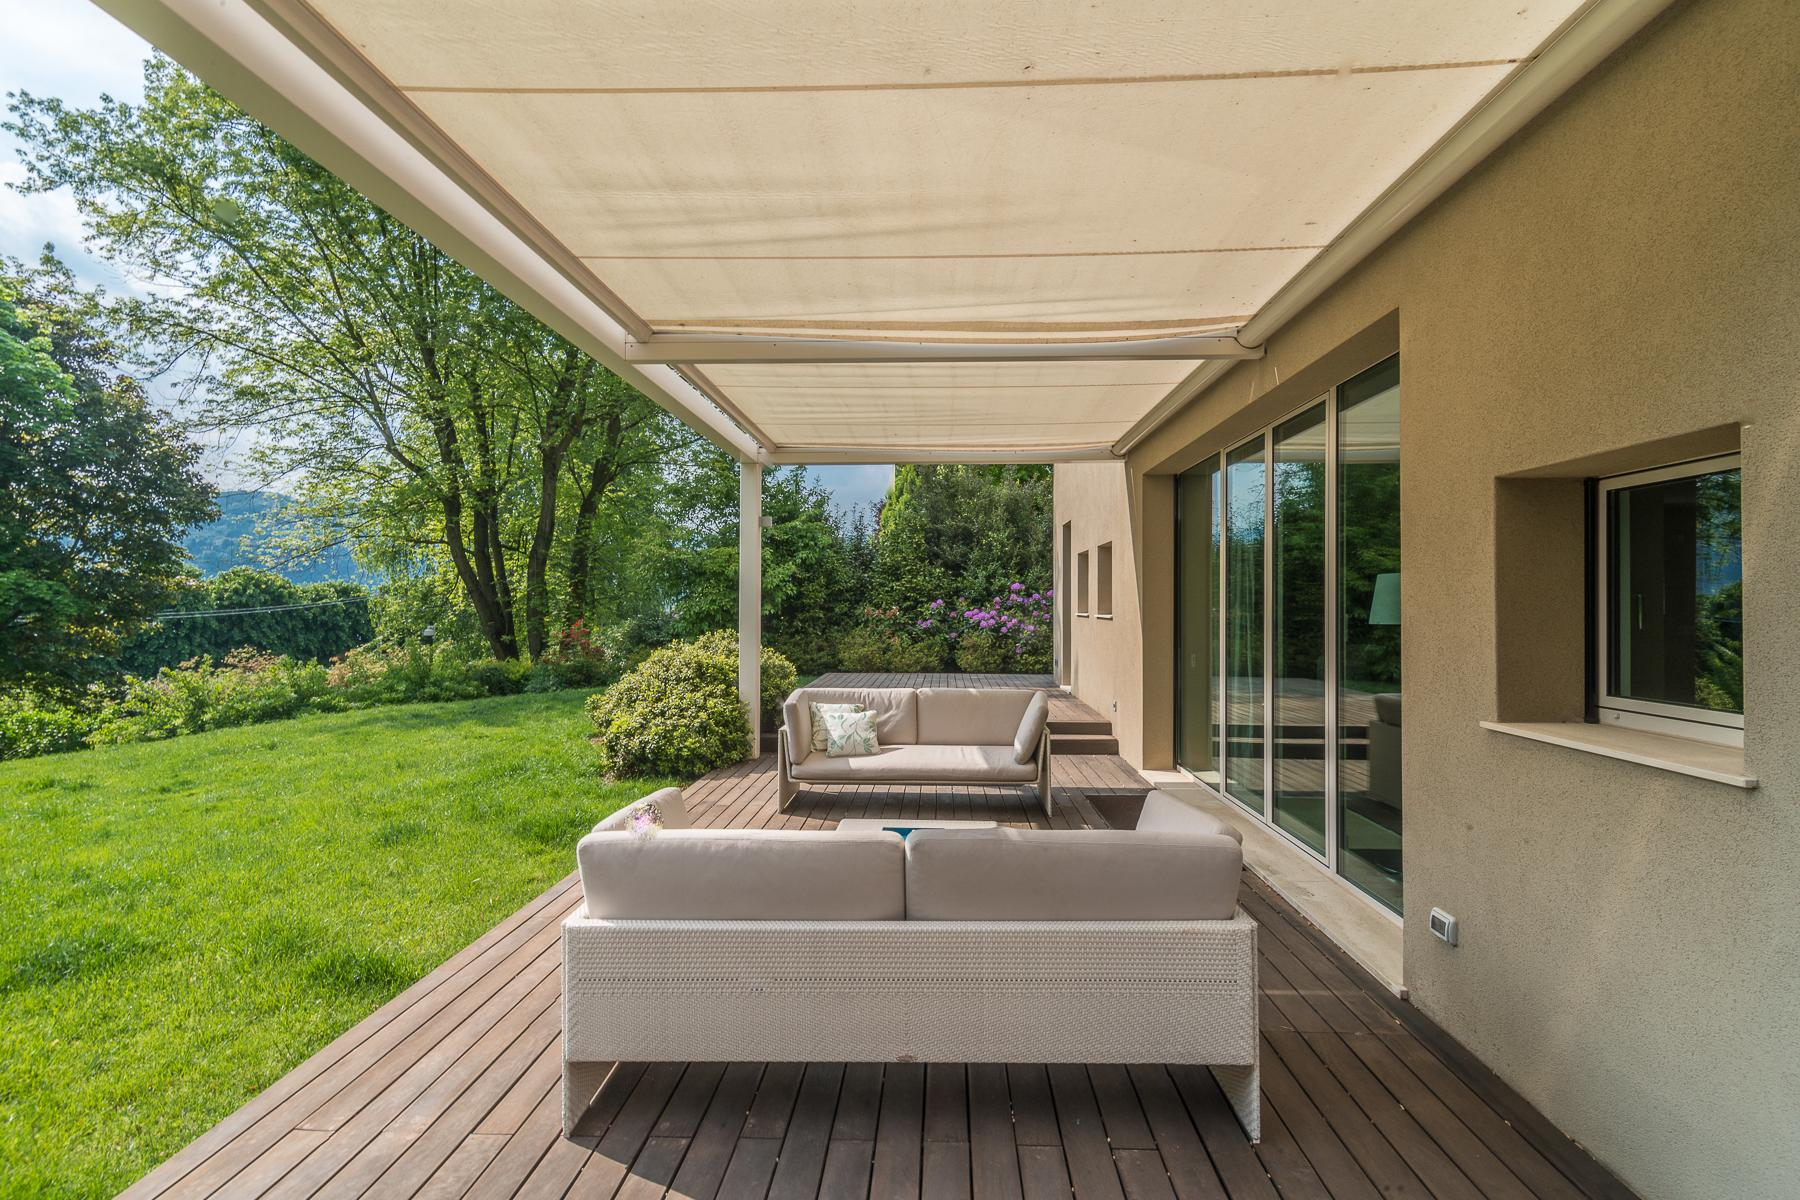 Maggiore湖泊生态友好设计独特的别墅 - 6